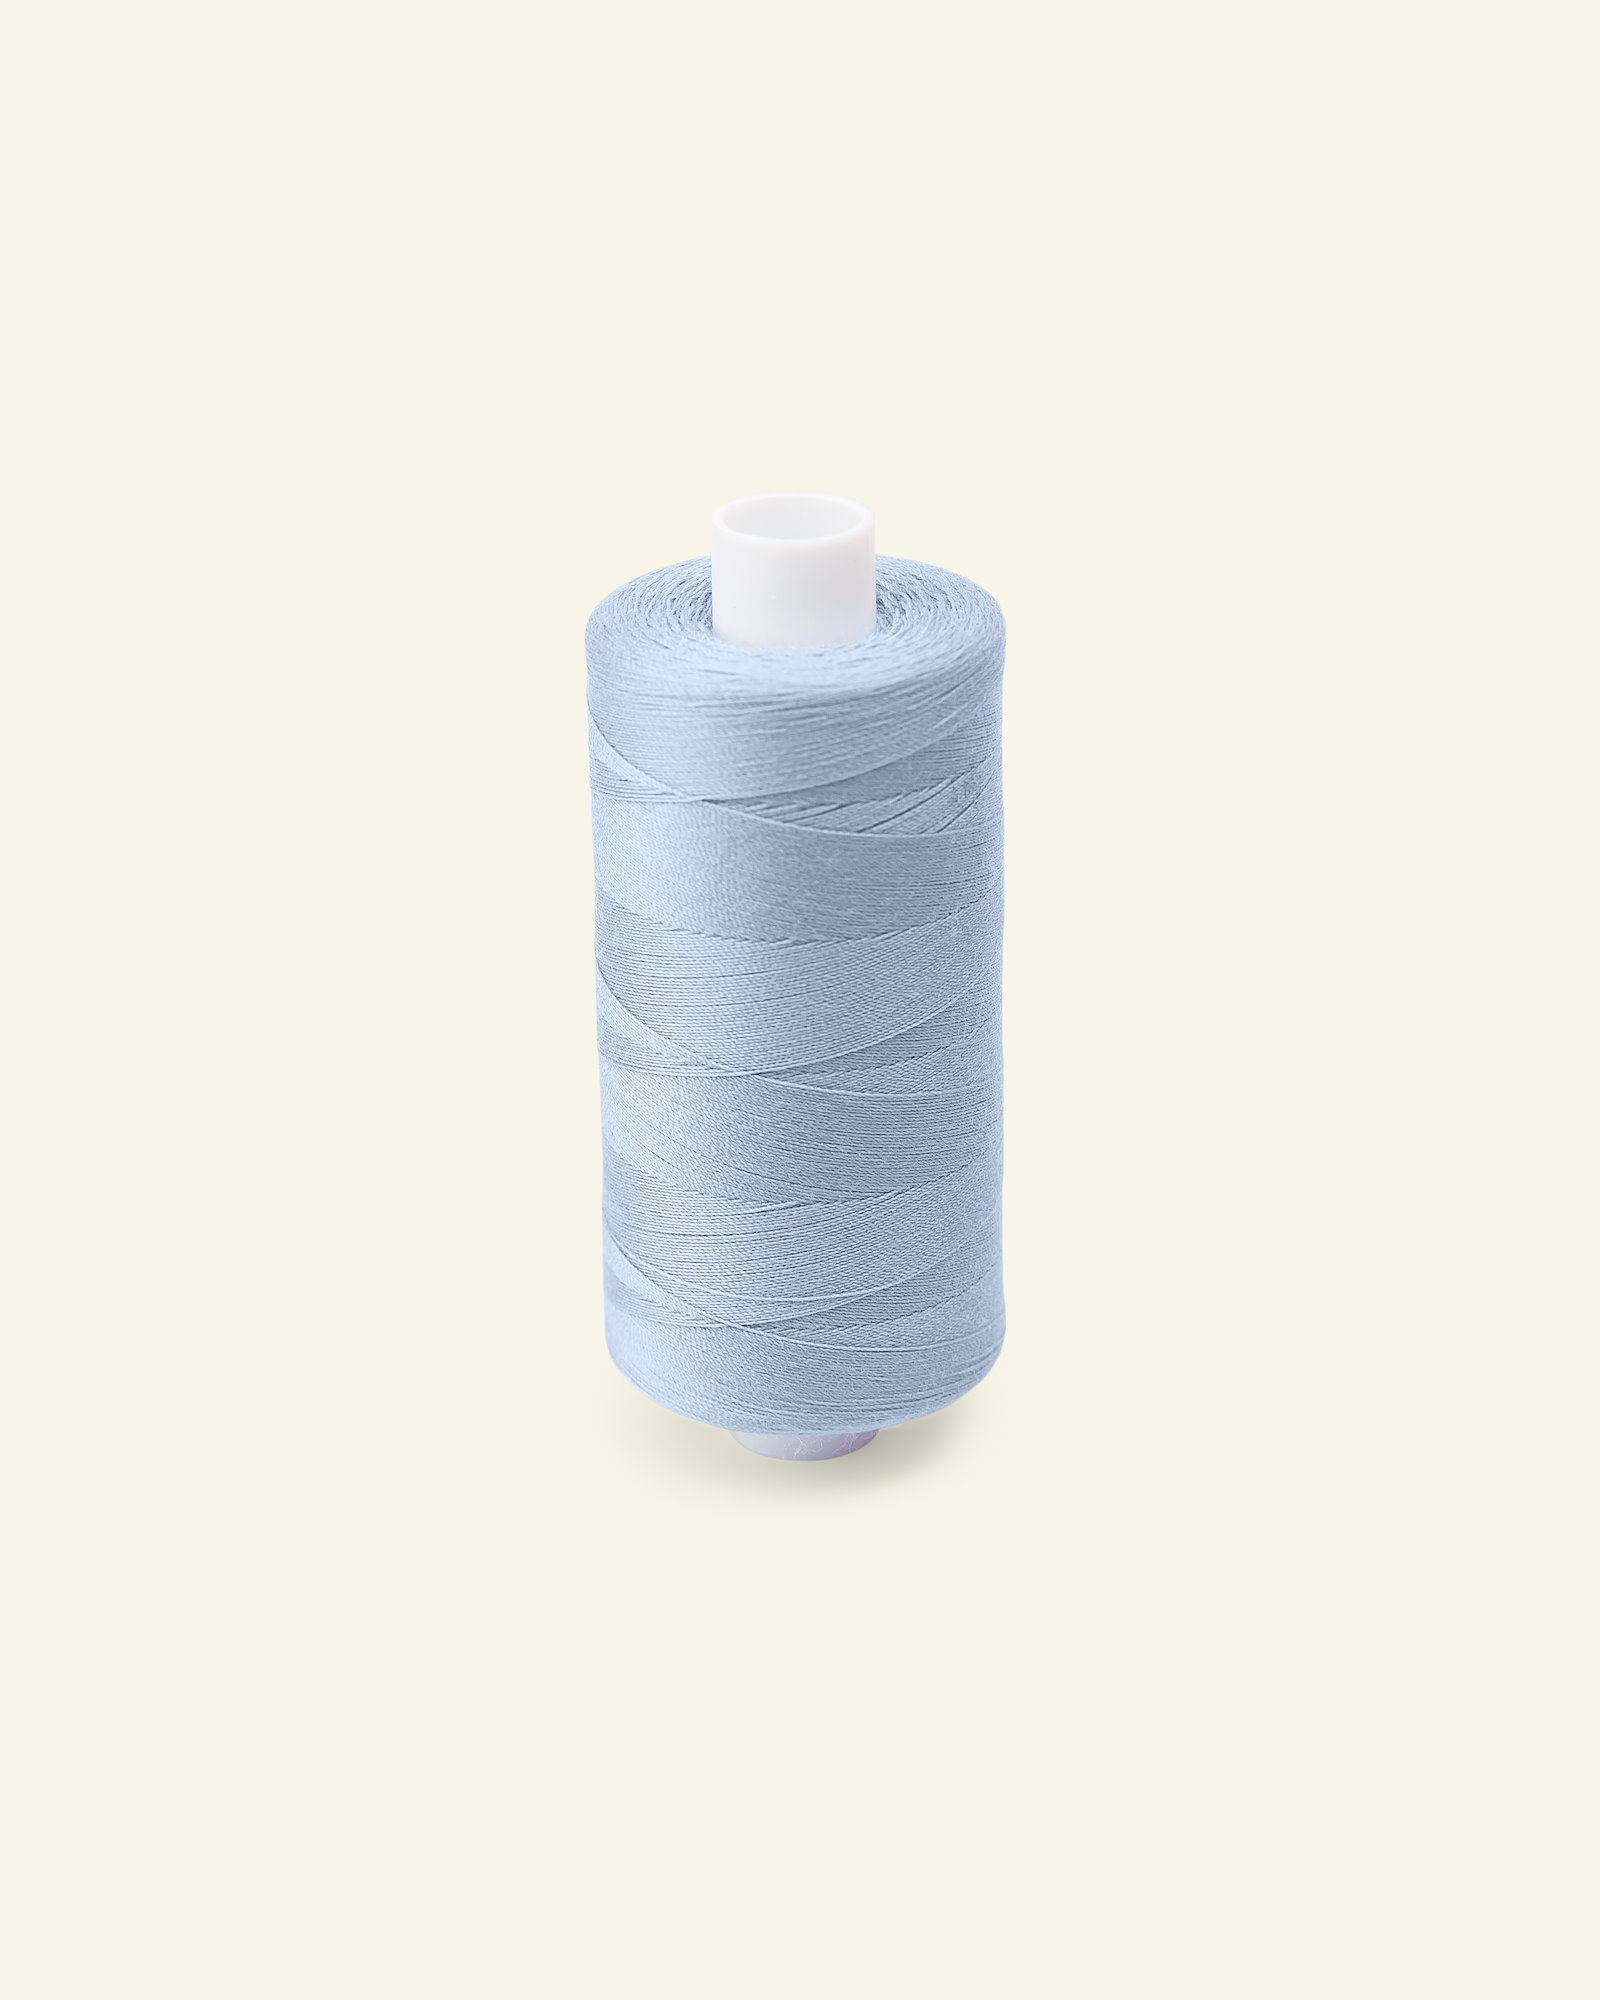 Sewing thread baby blue 1000m